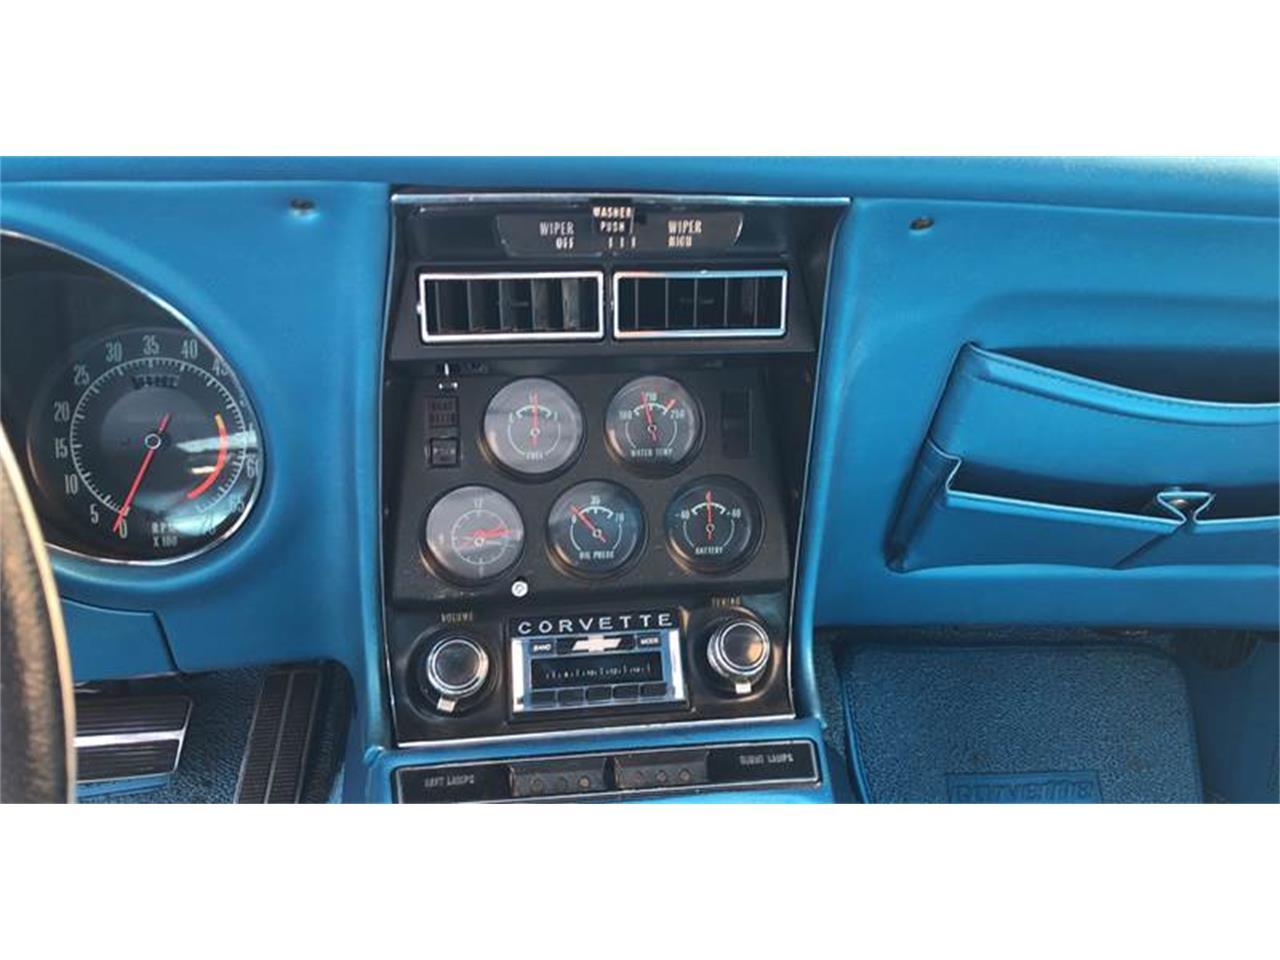 Large Picture of '69 Corvette located in Brea California Auction Vehicle - QEIM